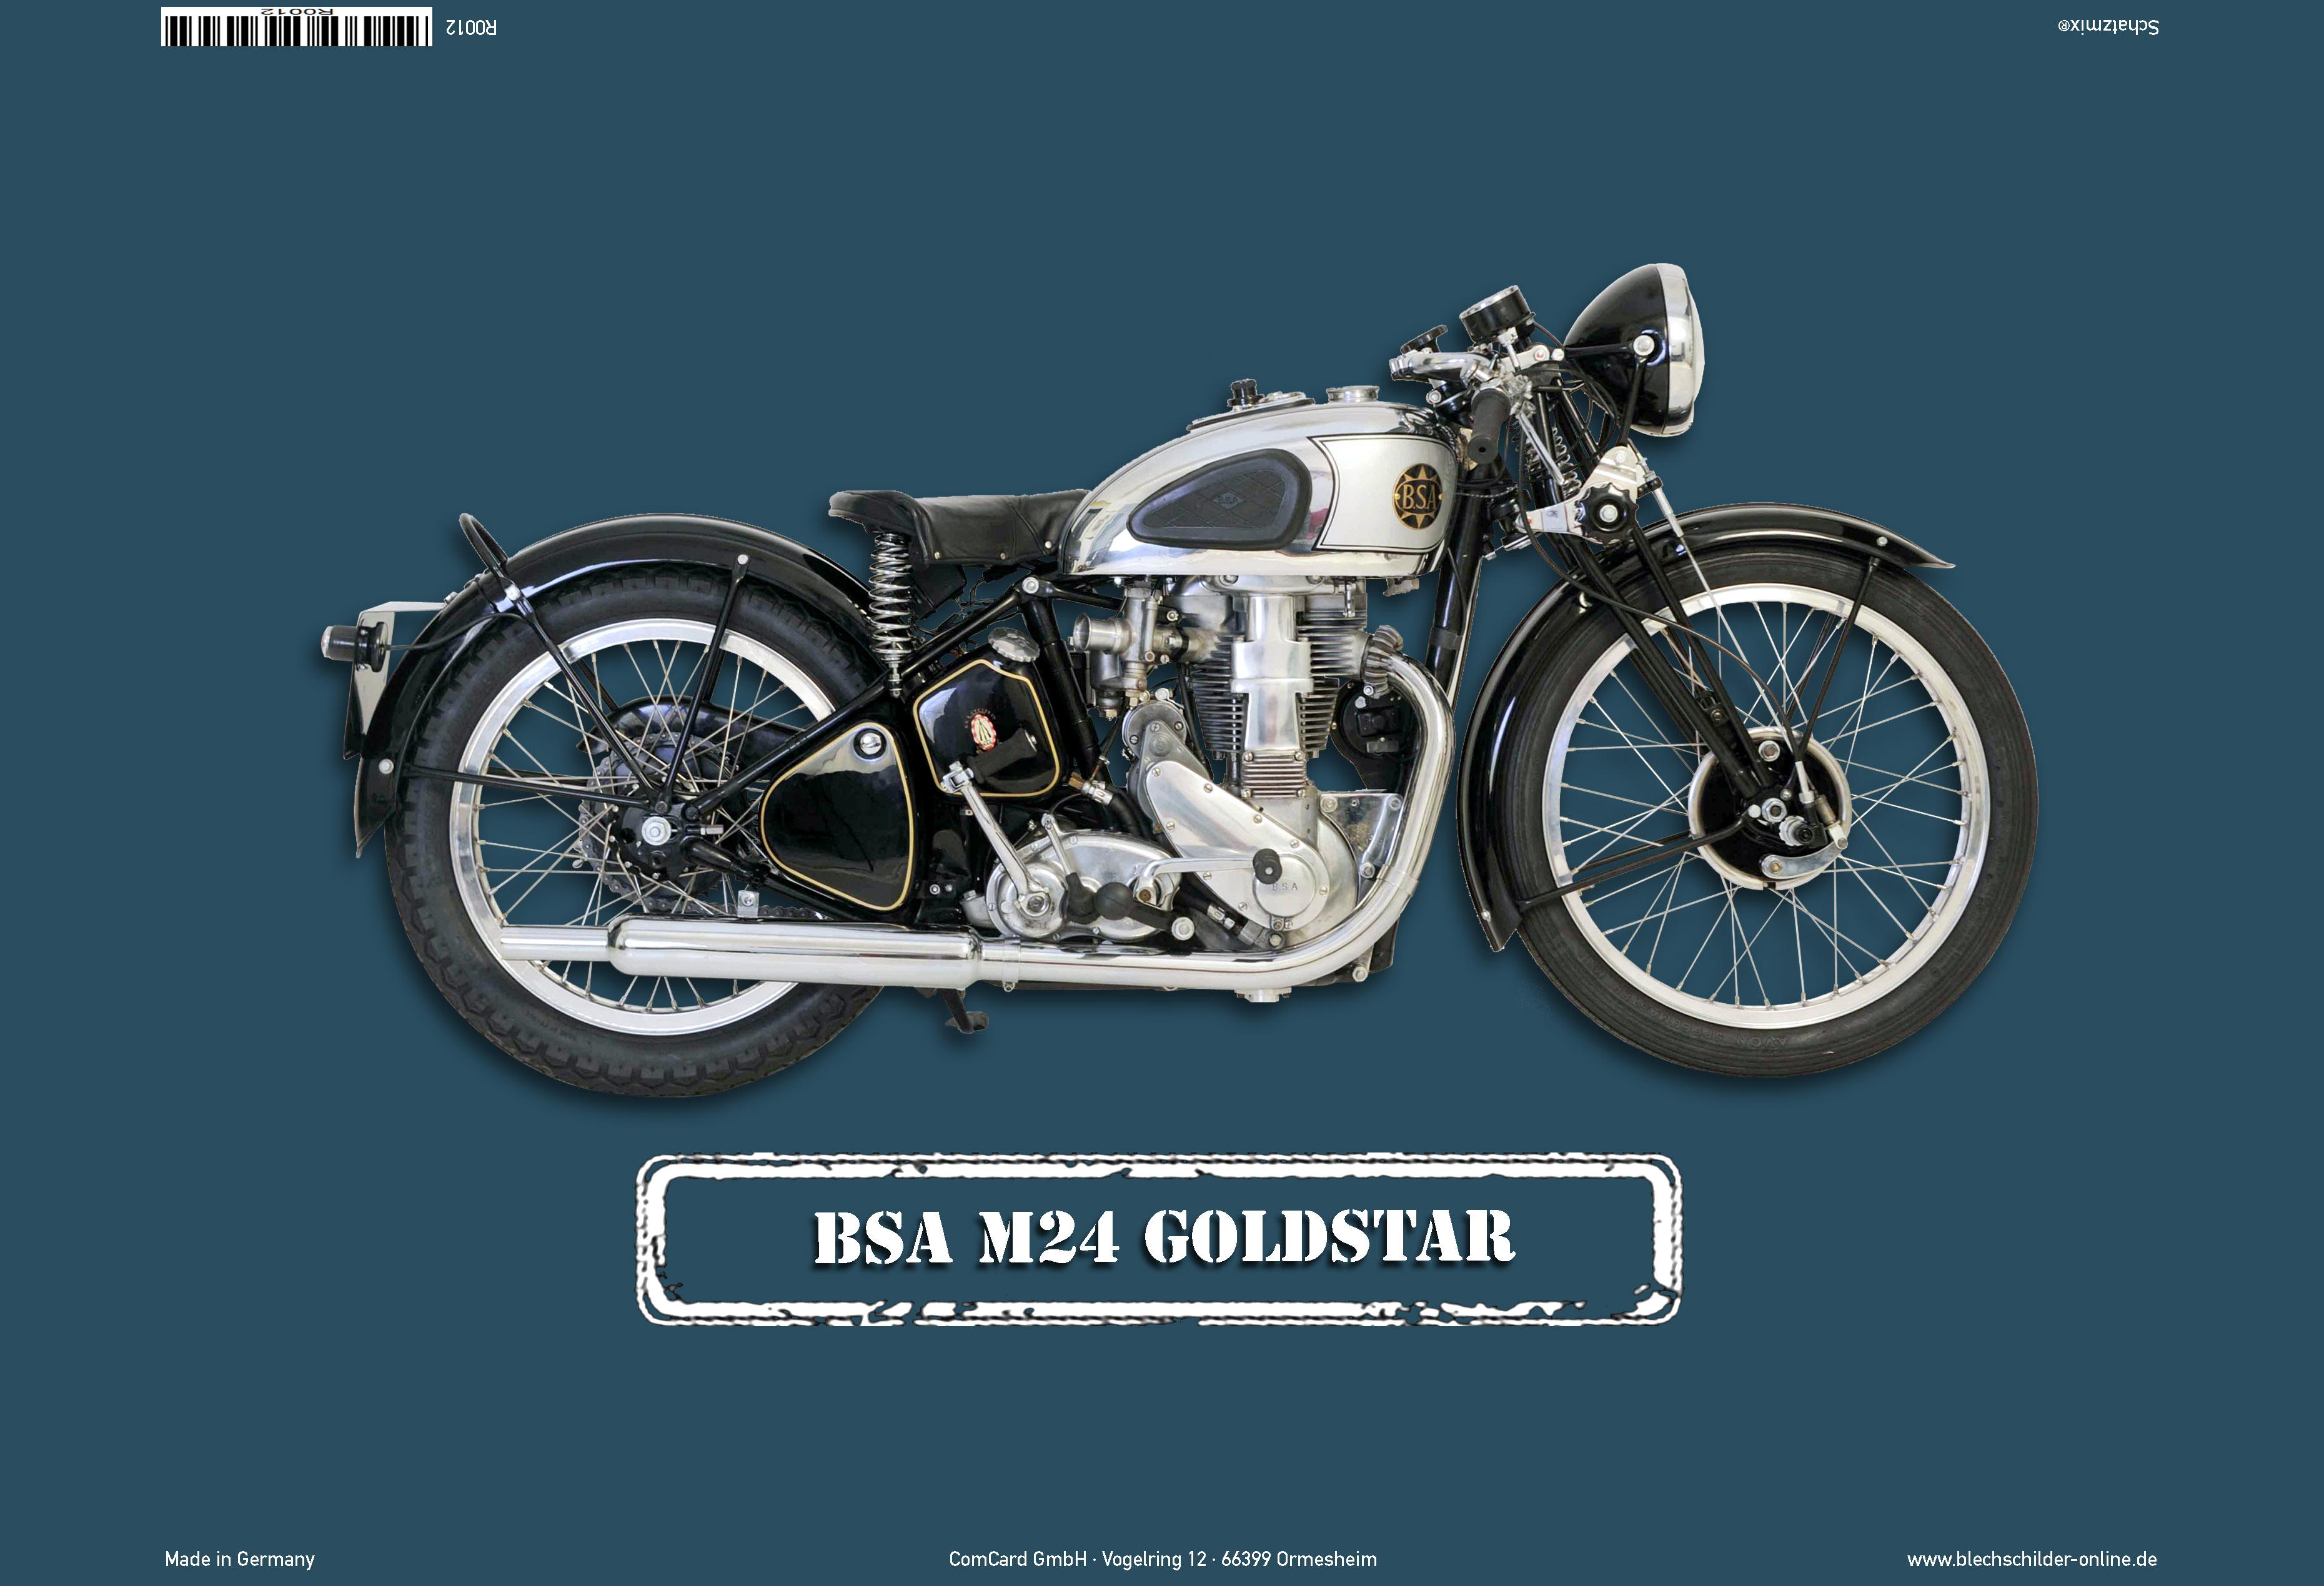 bsa m24 goldstar motorrad blechschild kaufen bei comcard gmbh. Black Bedroom Furniture Sets. Home Design Ideas